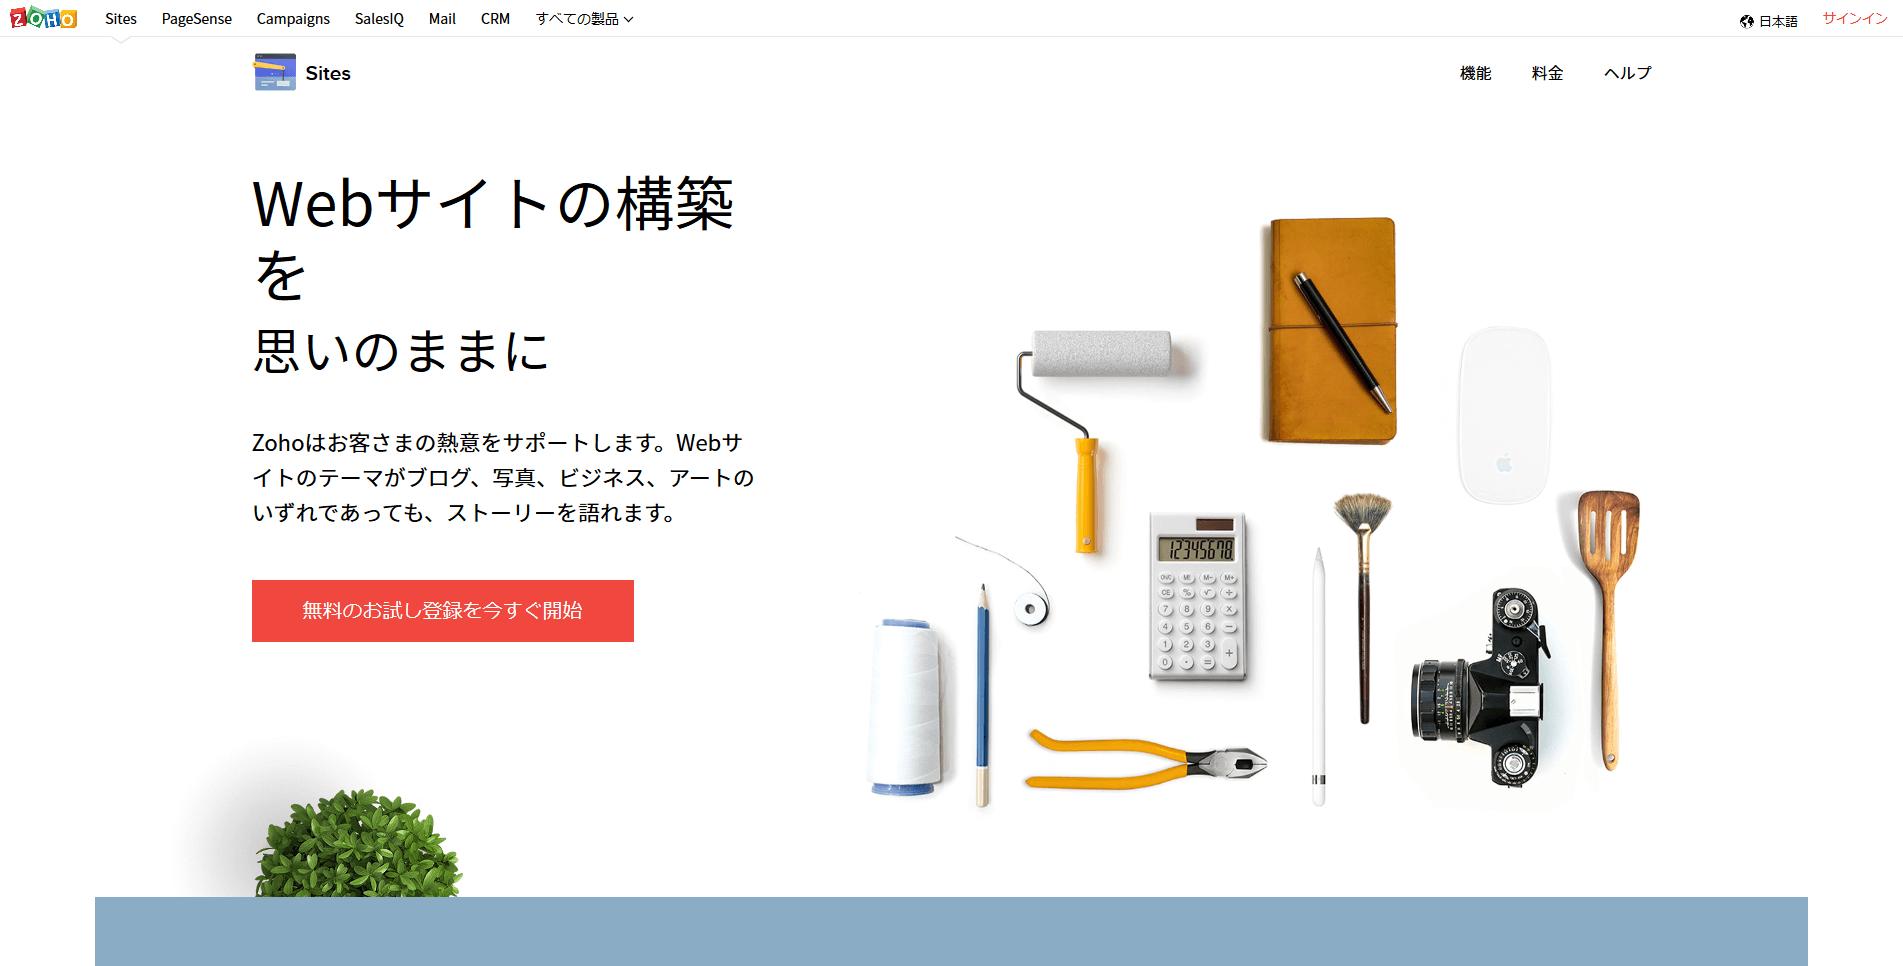 Zoho Sites(ゾーホーサイト)